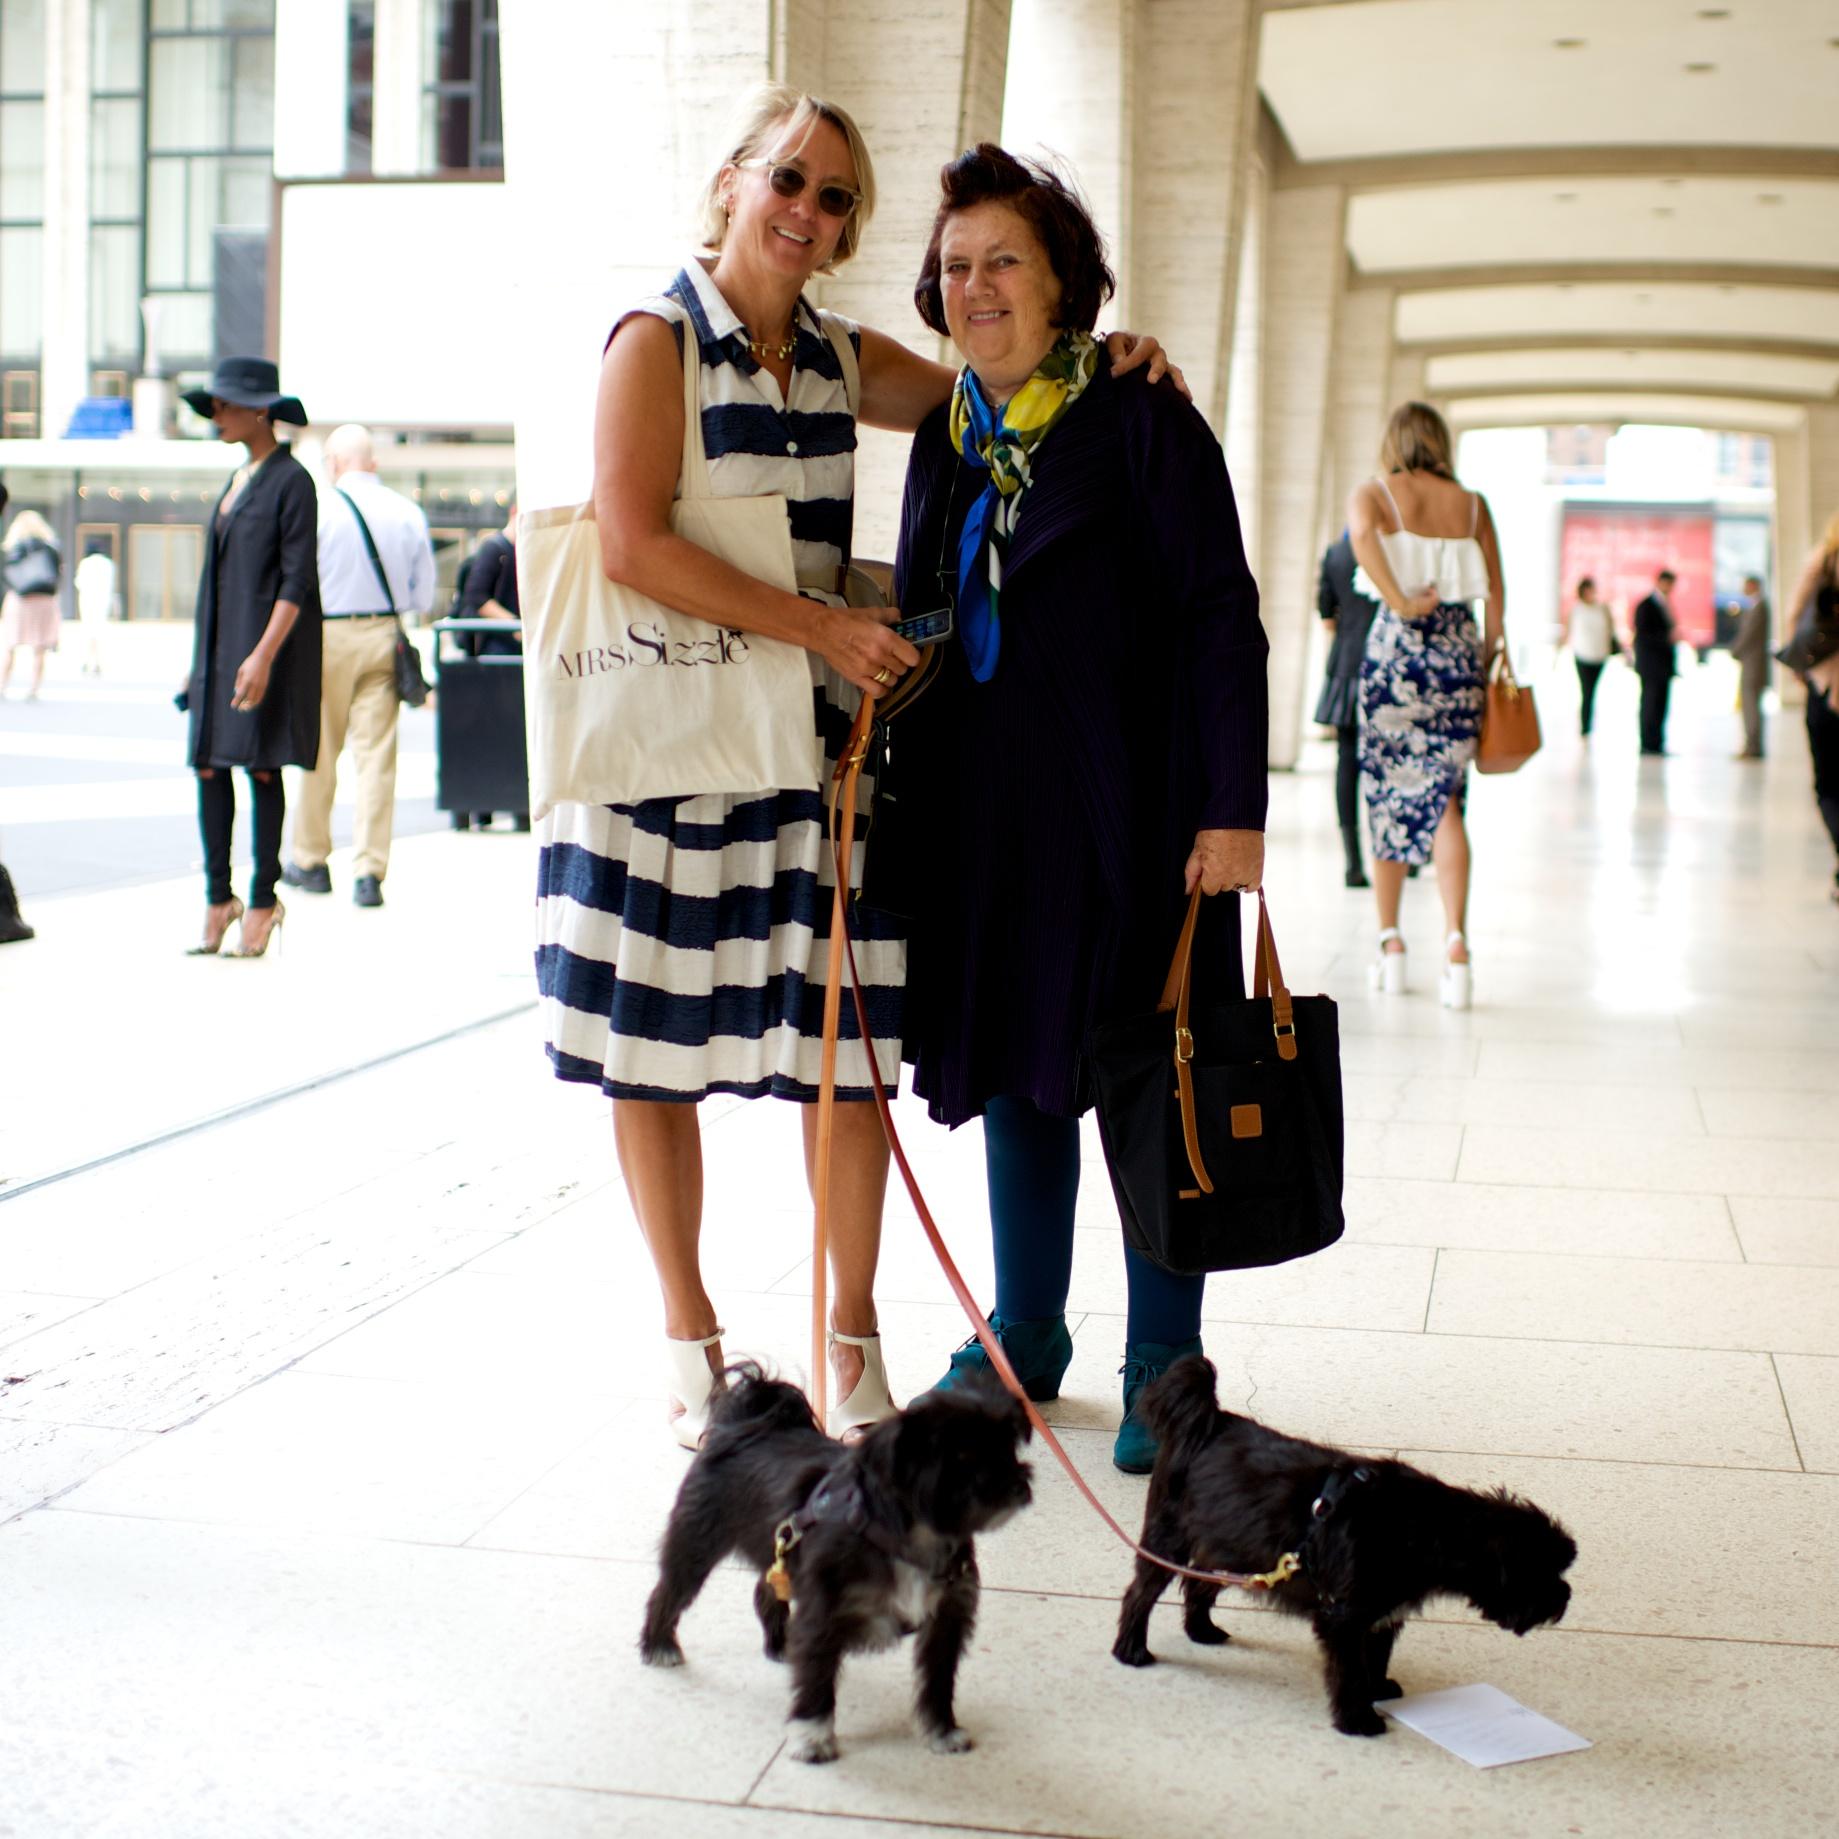 Mrs. Sizzle and Suzy Menkes taking Shinola leashes to the street.